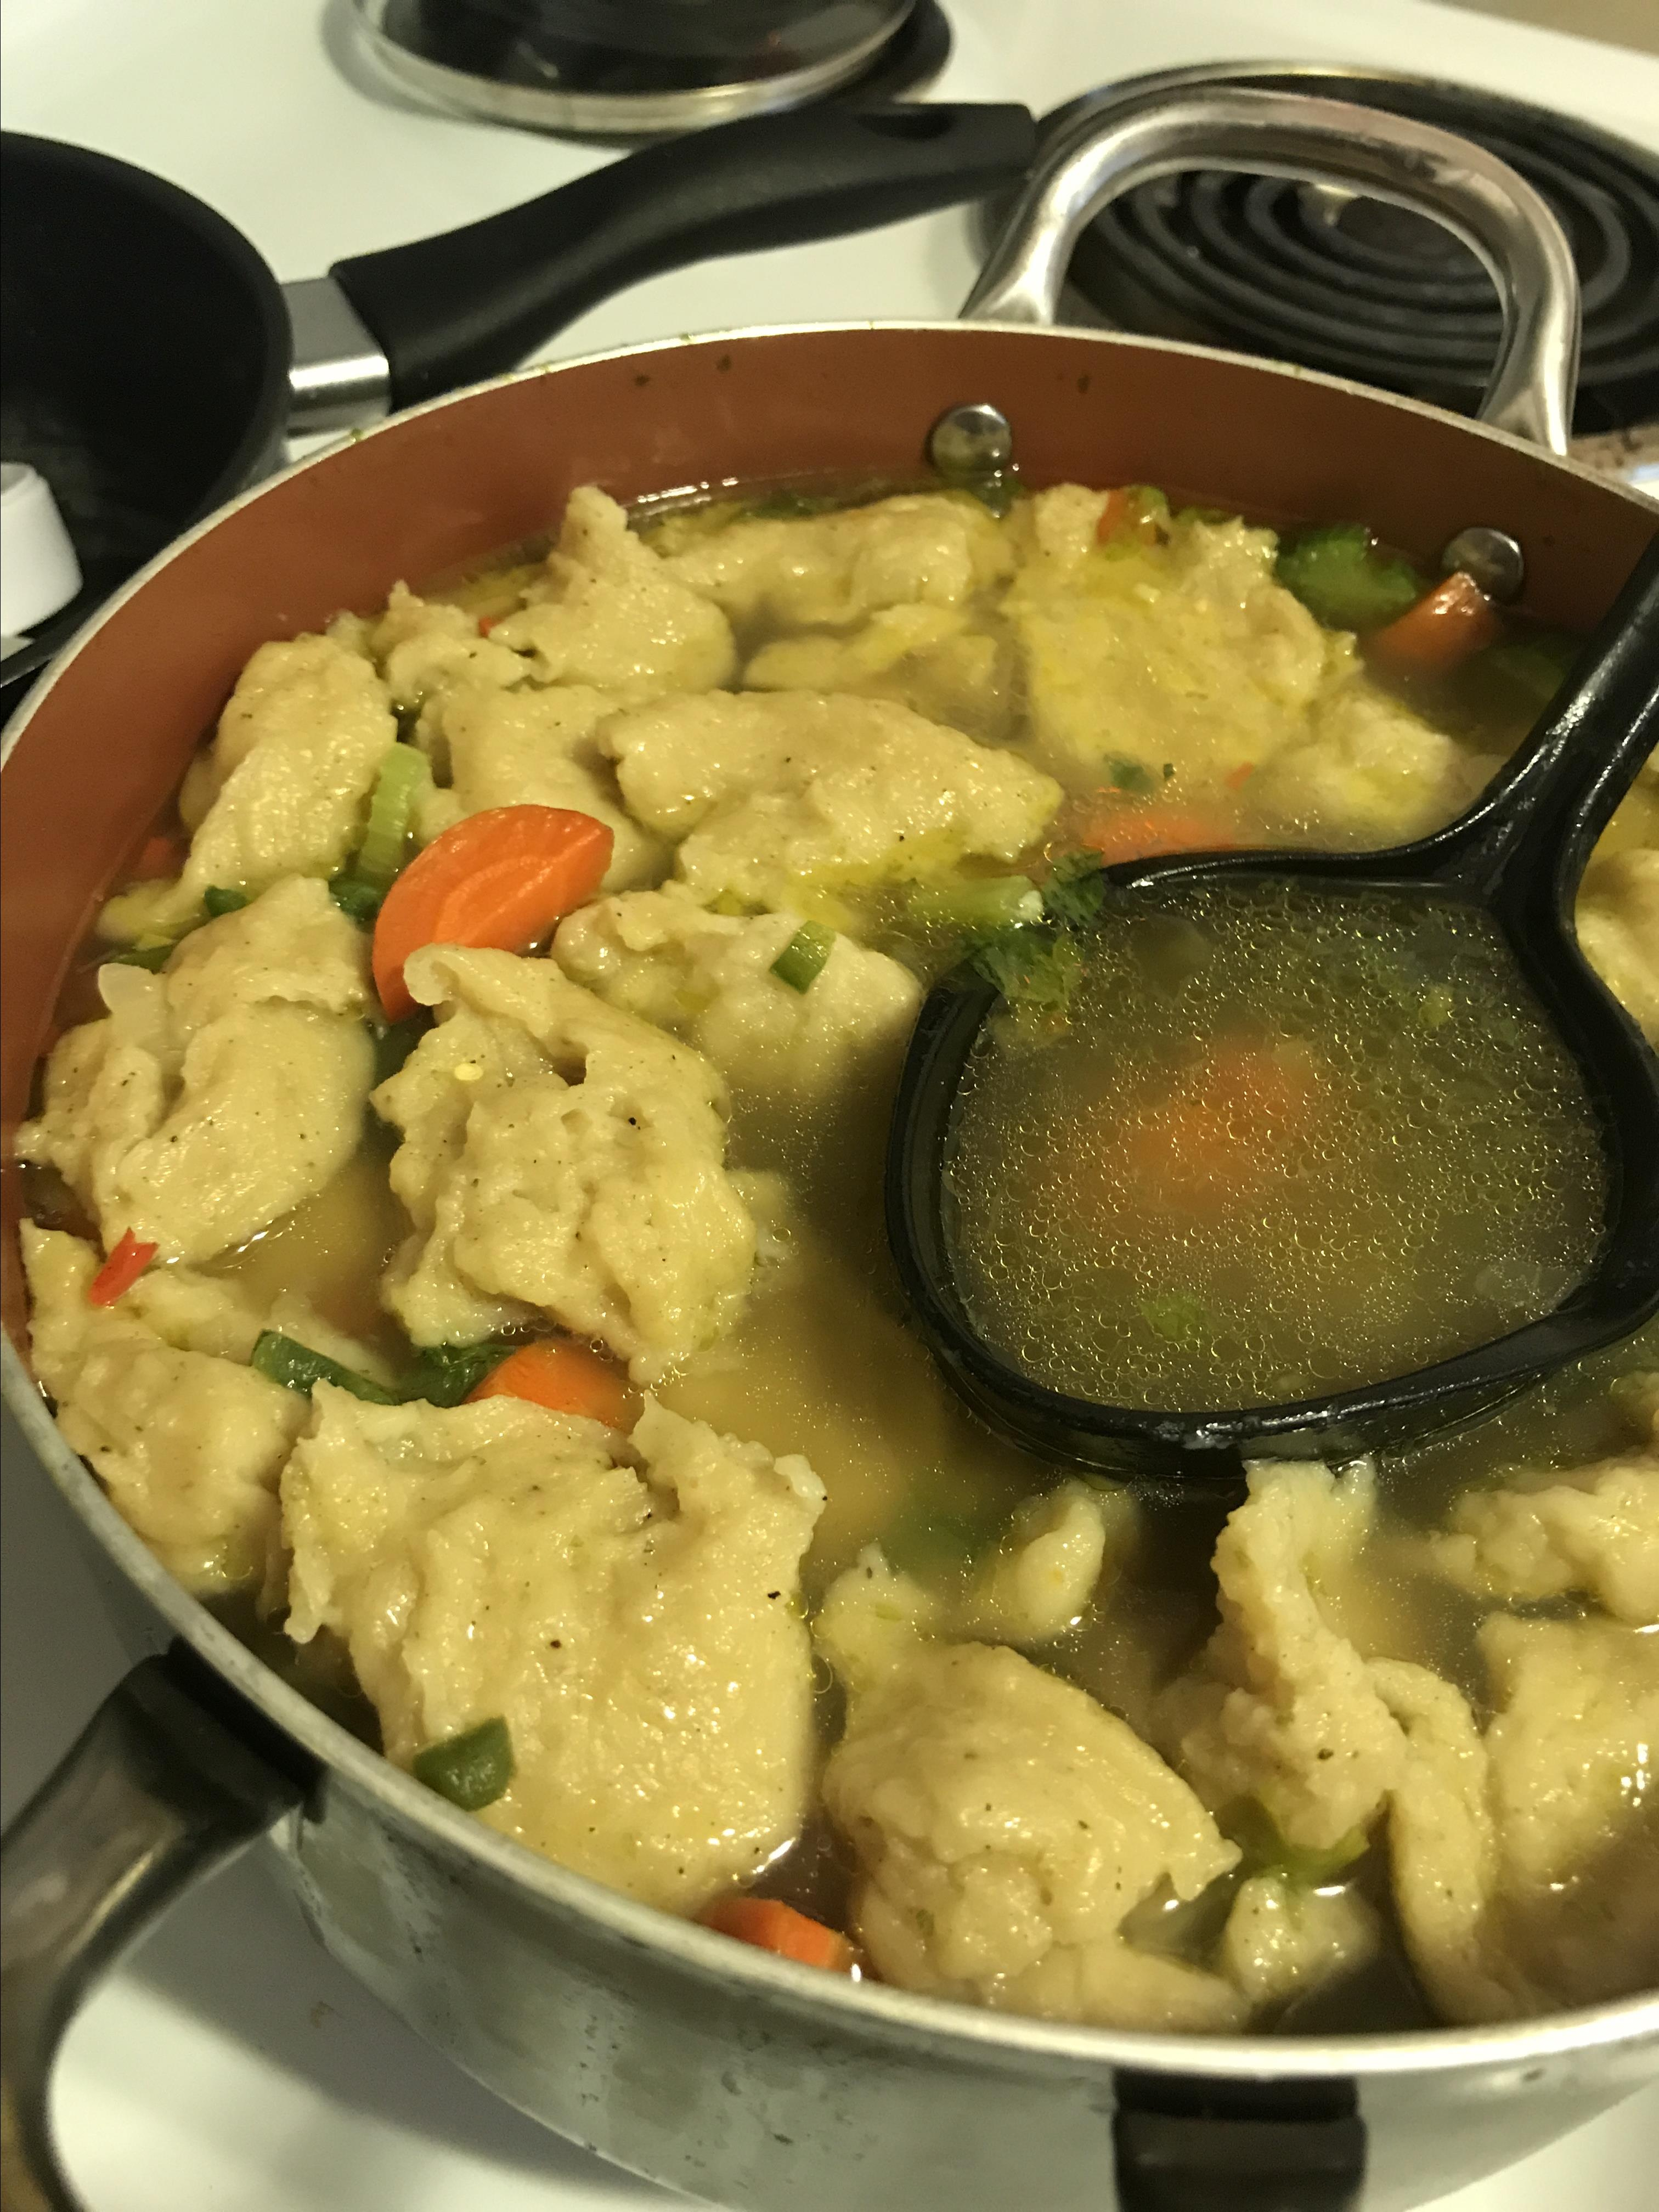 Polish Chicken and Dumplings